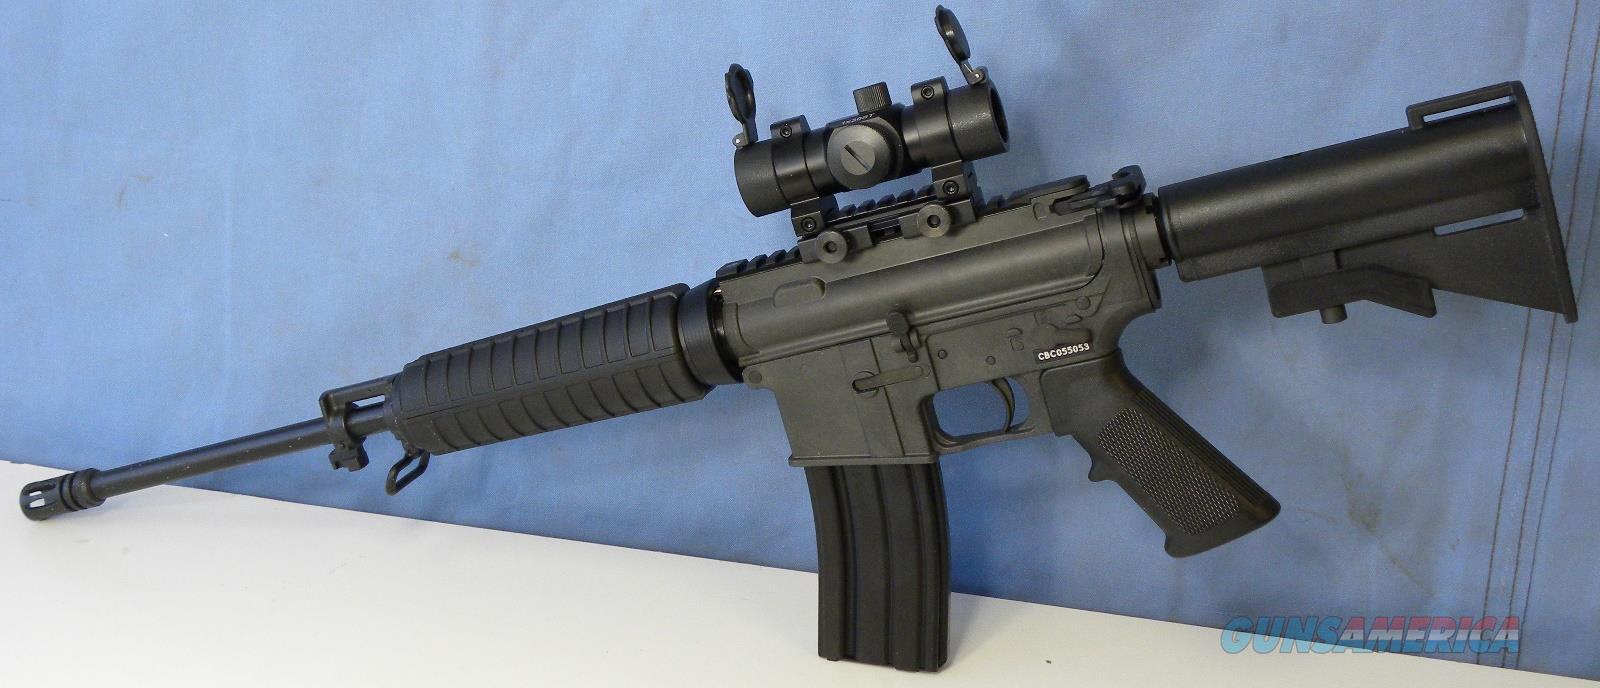 Bushmaster Carbon 15 Optics Ready  Guns > Rifles > Bushmaster Rifles > Complete Rifles